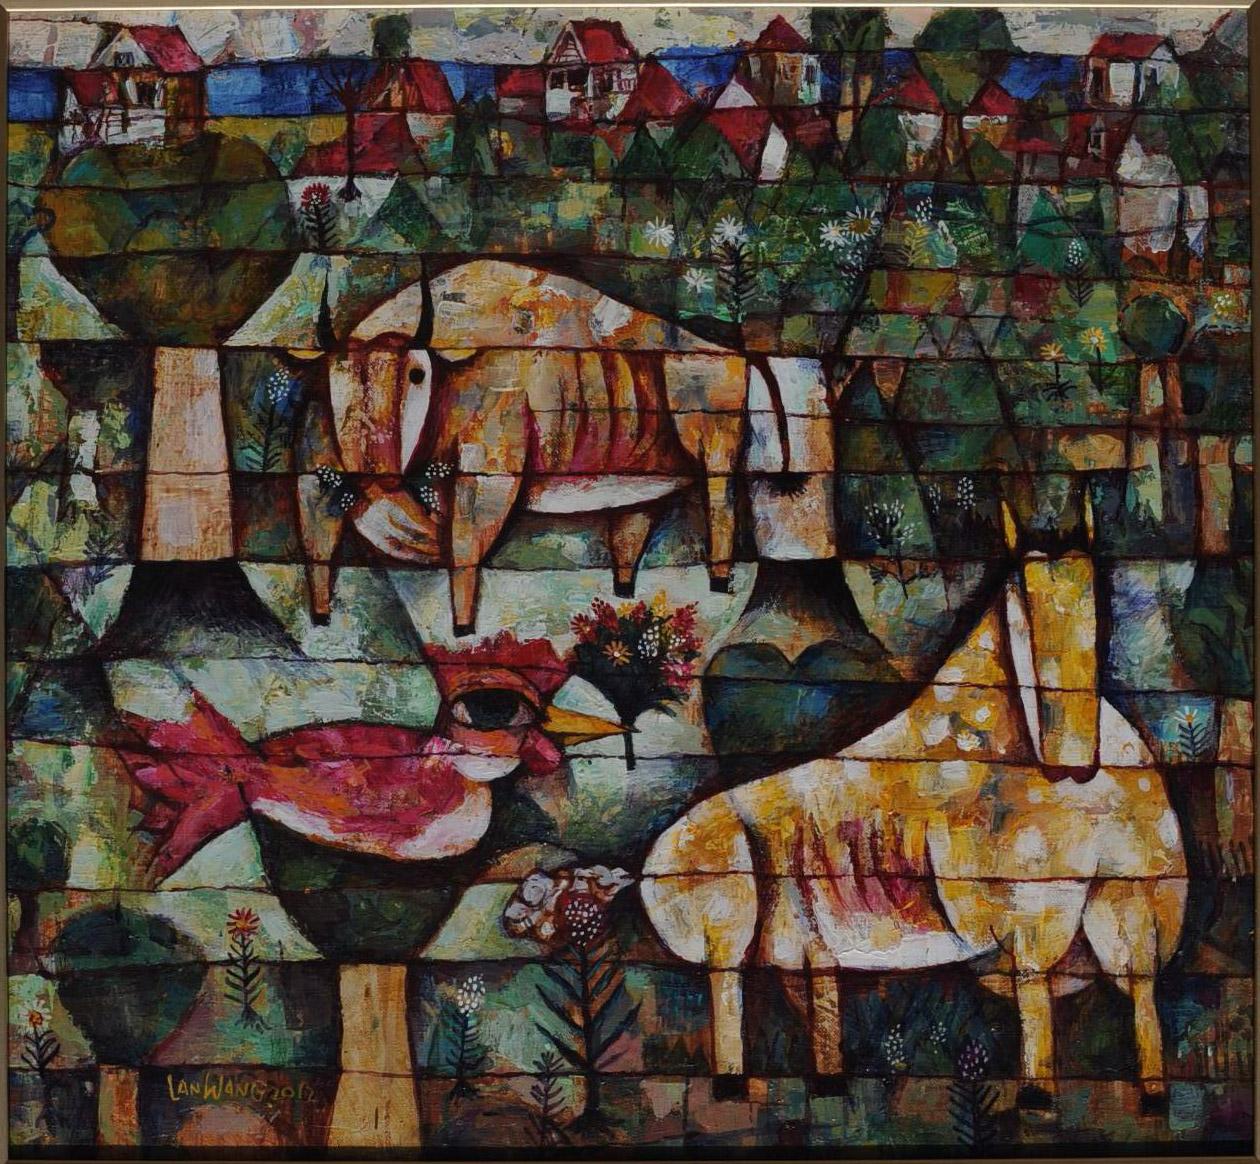 06-home-no2-2012-71-x-65-cm-canvas-2000